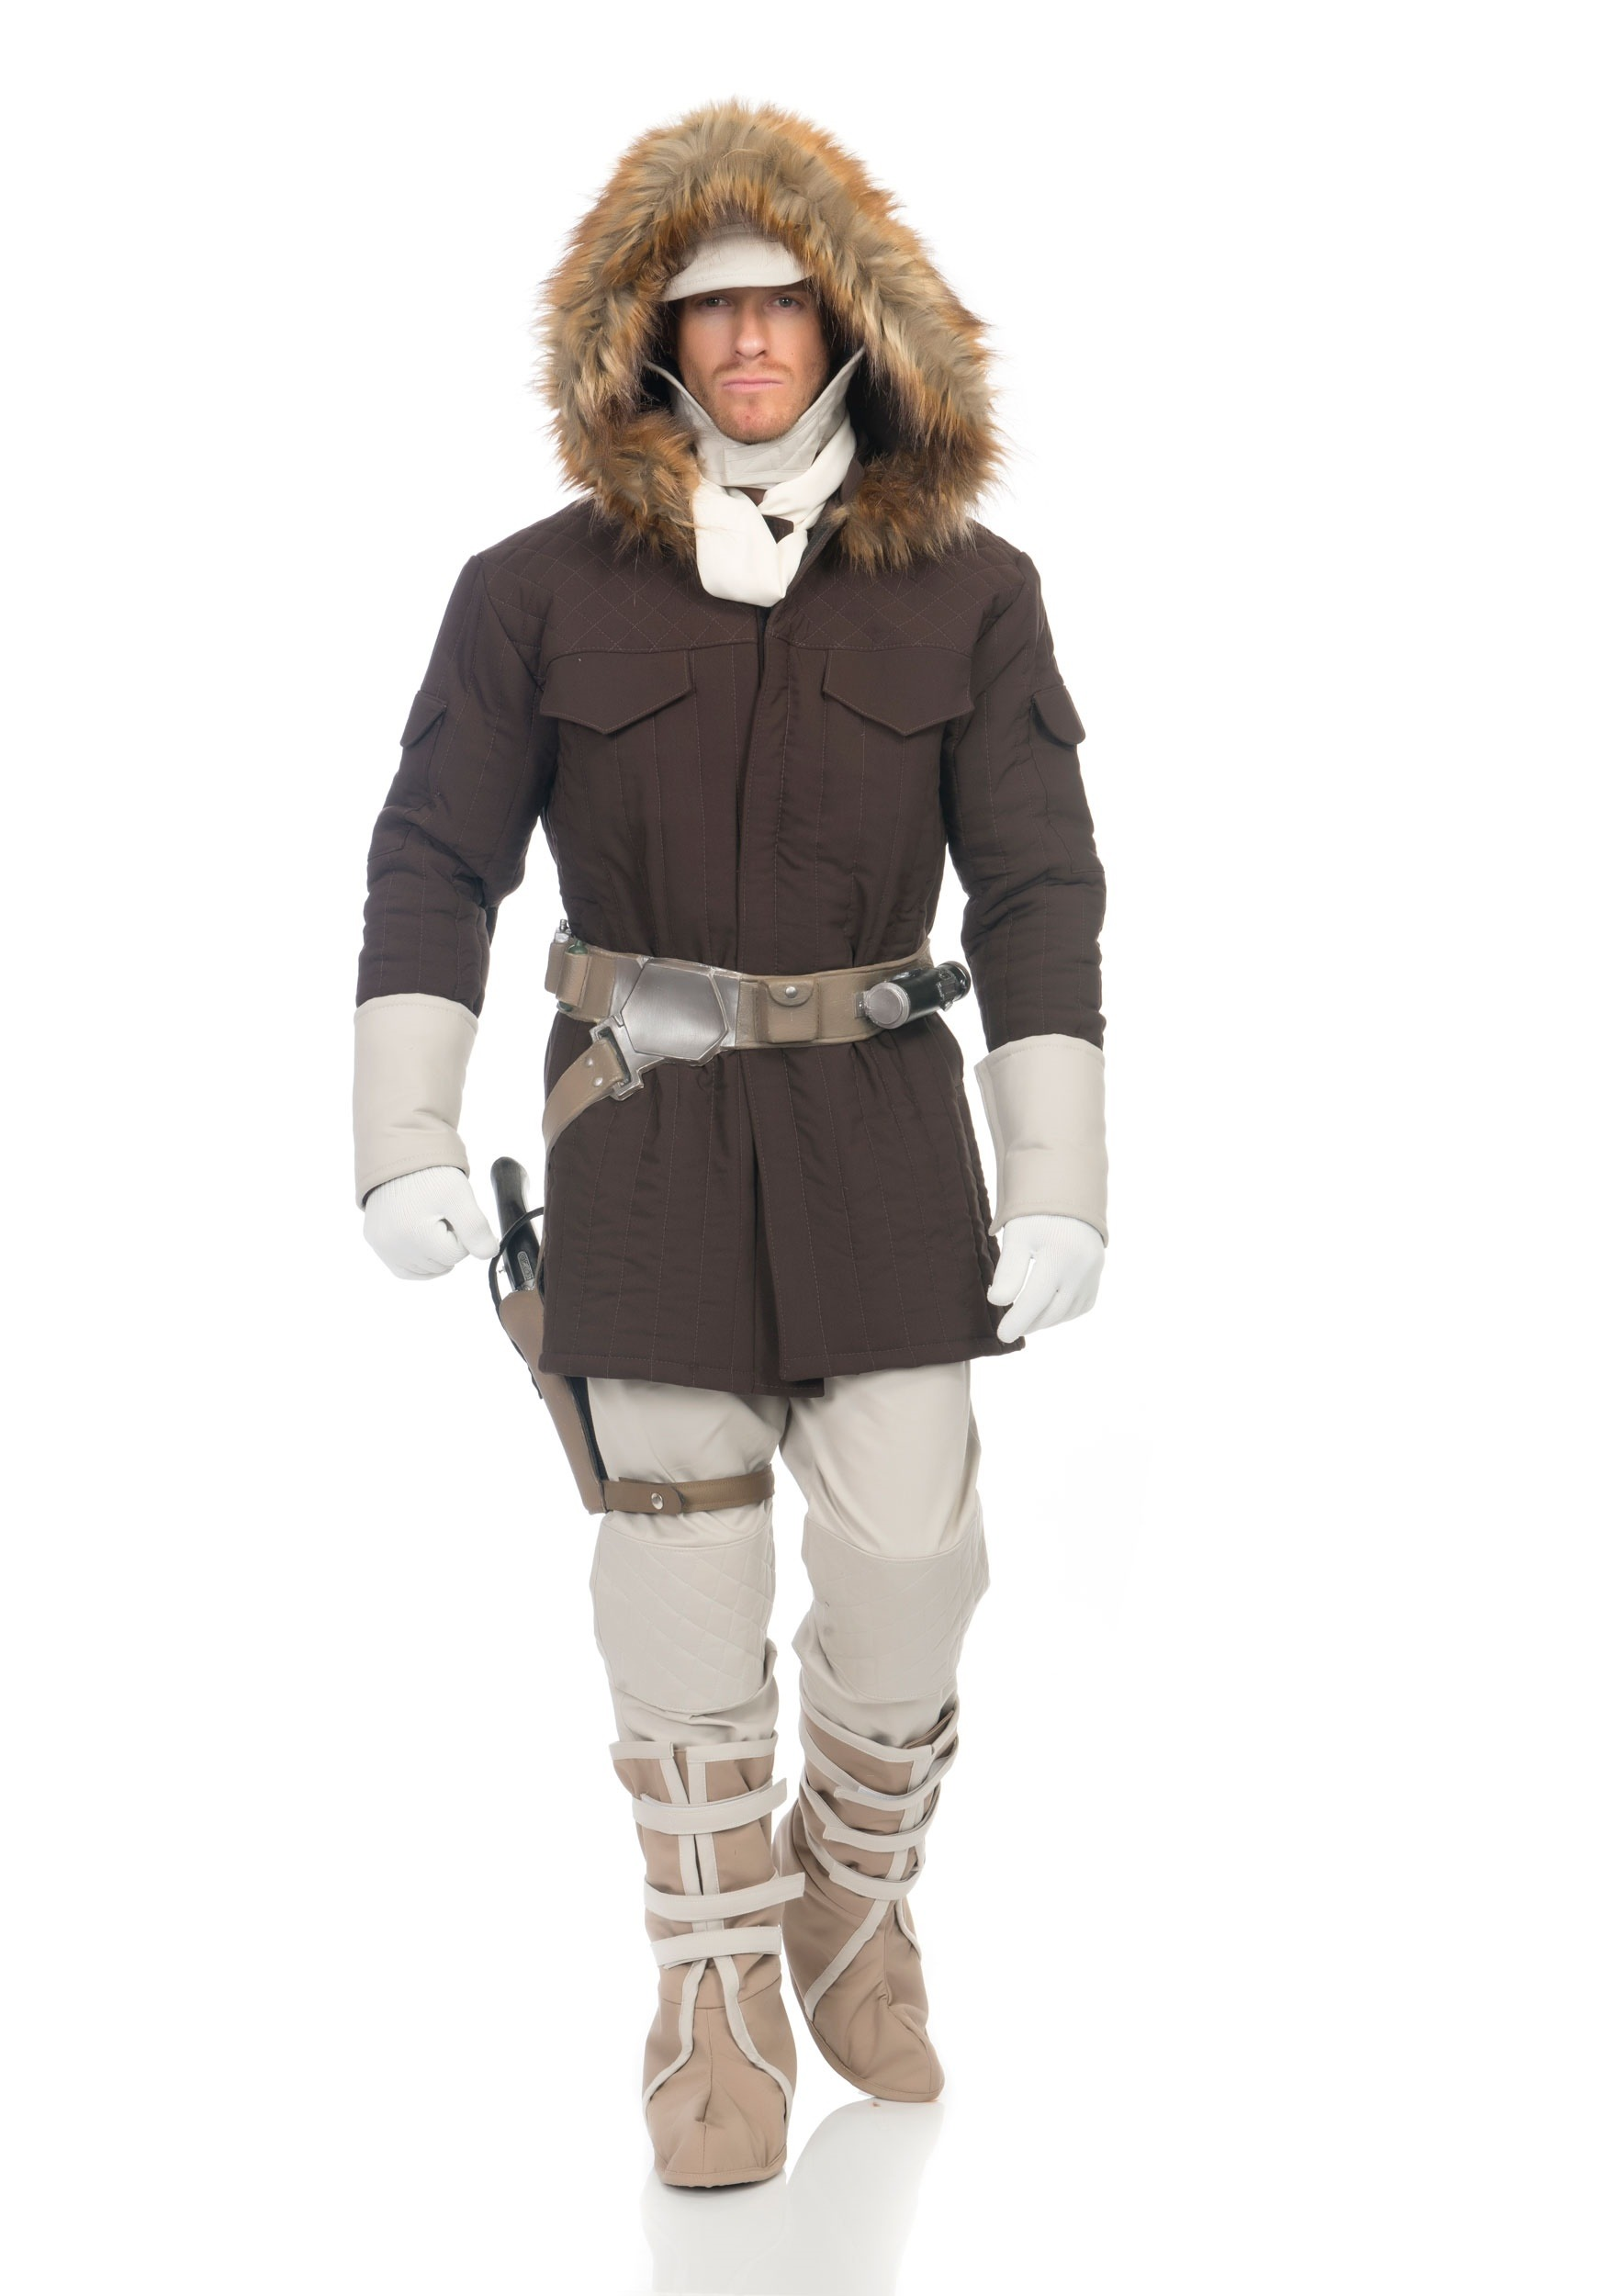 Han Solo Costumes